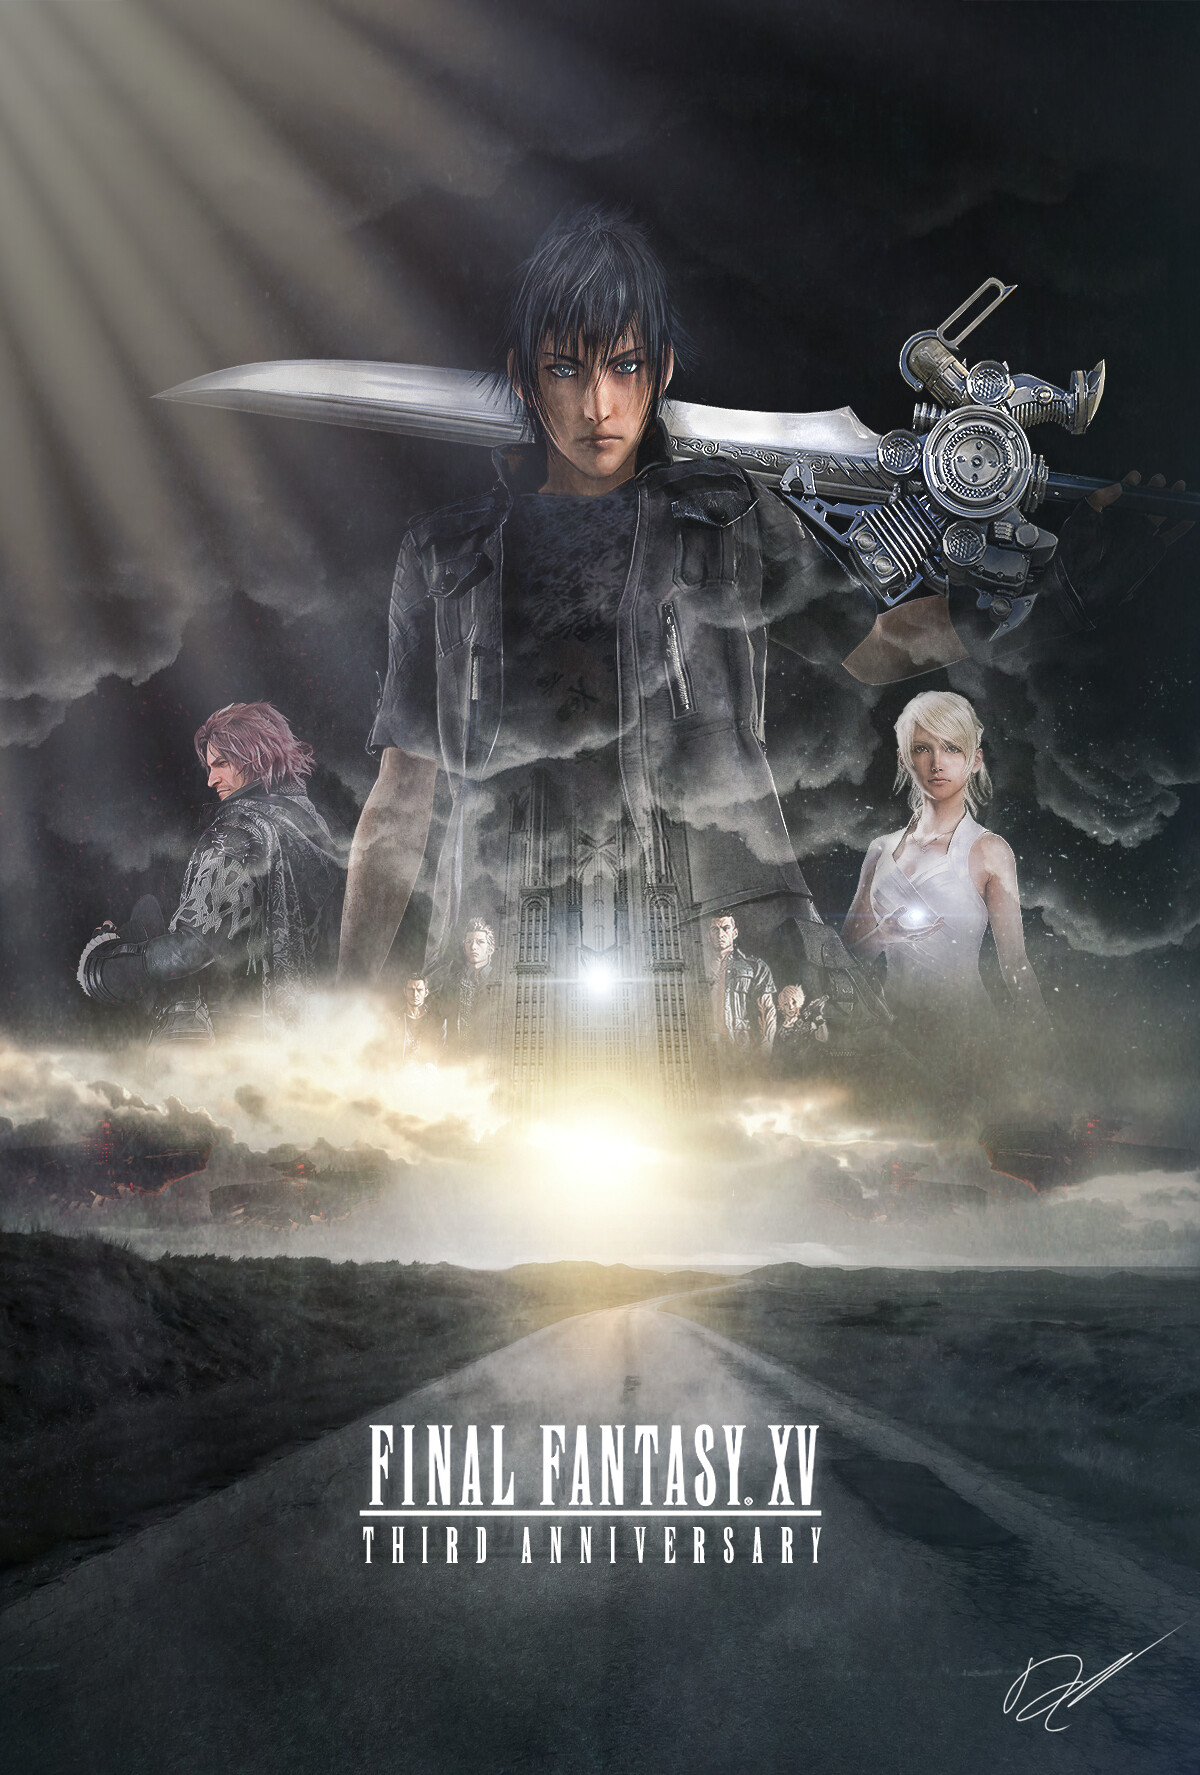 final fantasy xv third anniversary poster